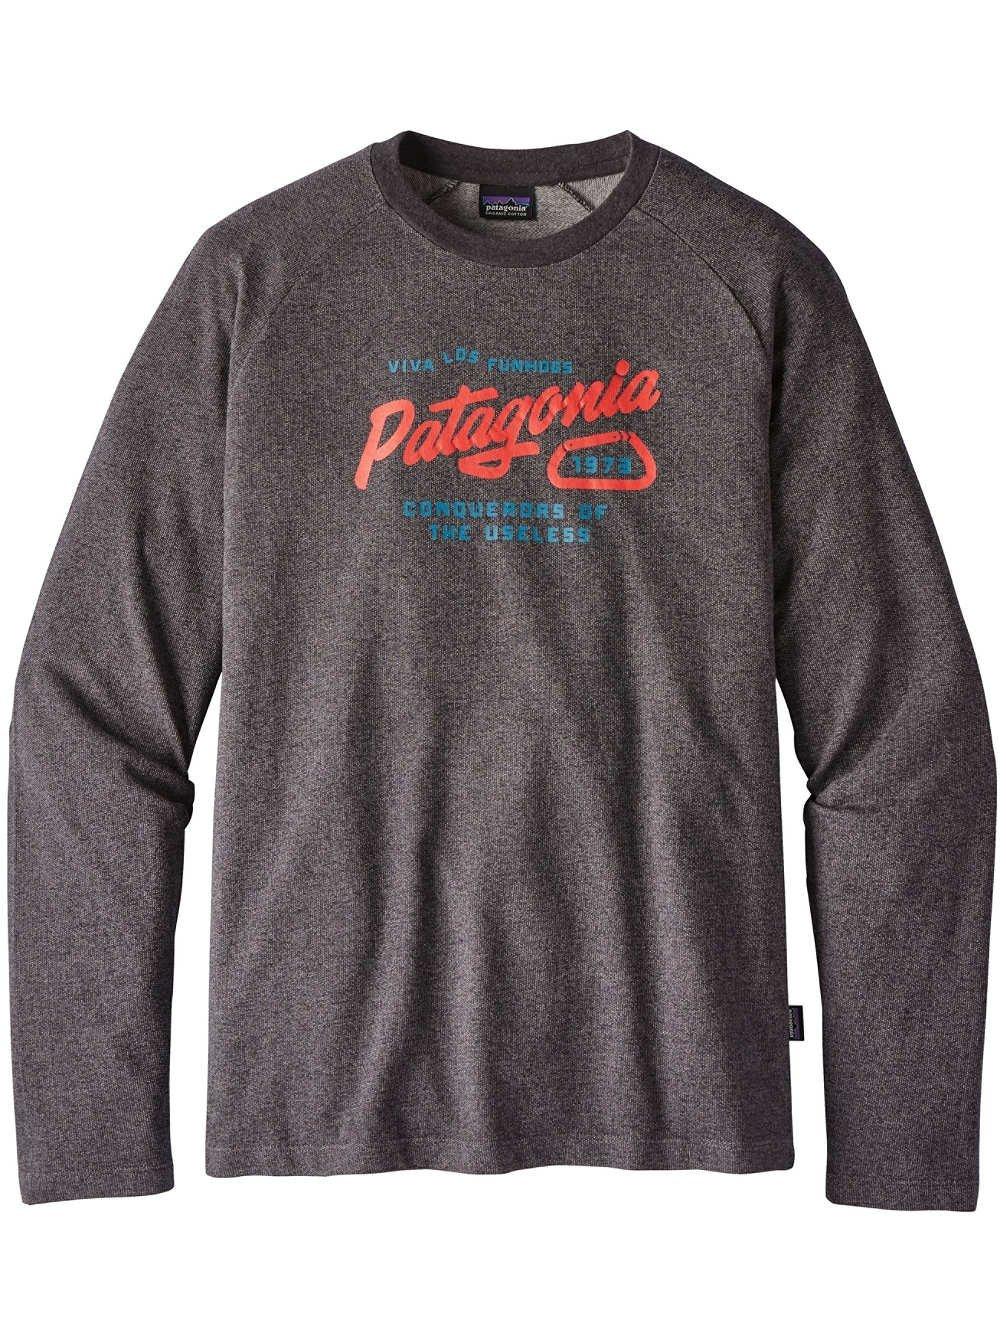 Patagonia M & 039;S Splitter Skript LW Crew Sweatshirt, Sweatshirt